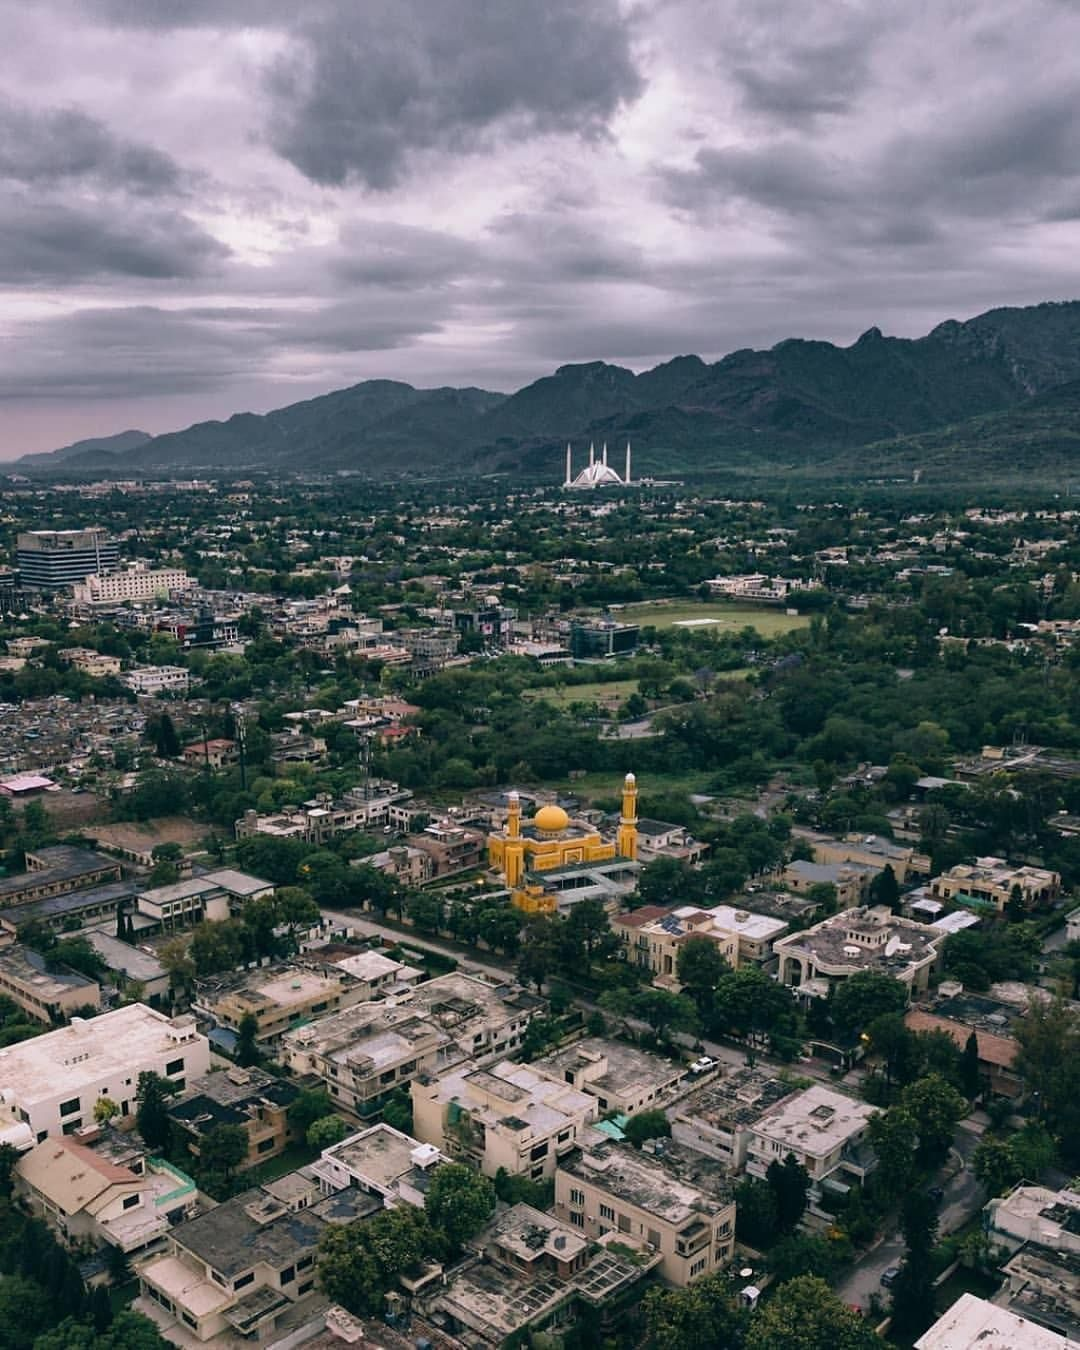 Islamabad (اسلام آباد ) is the capital city of Pakistan